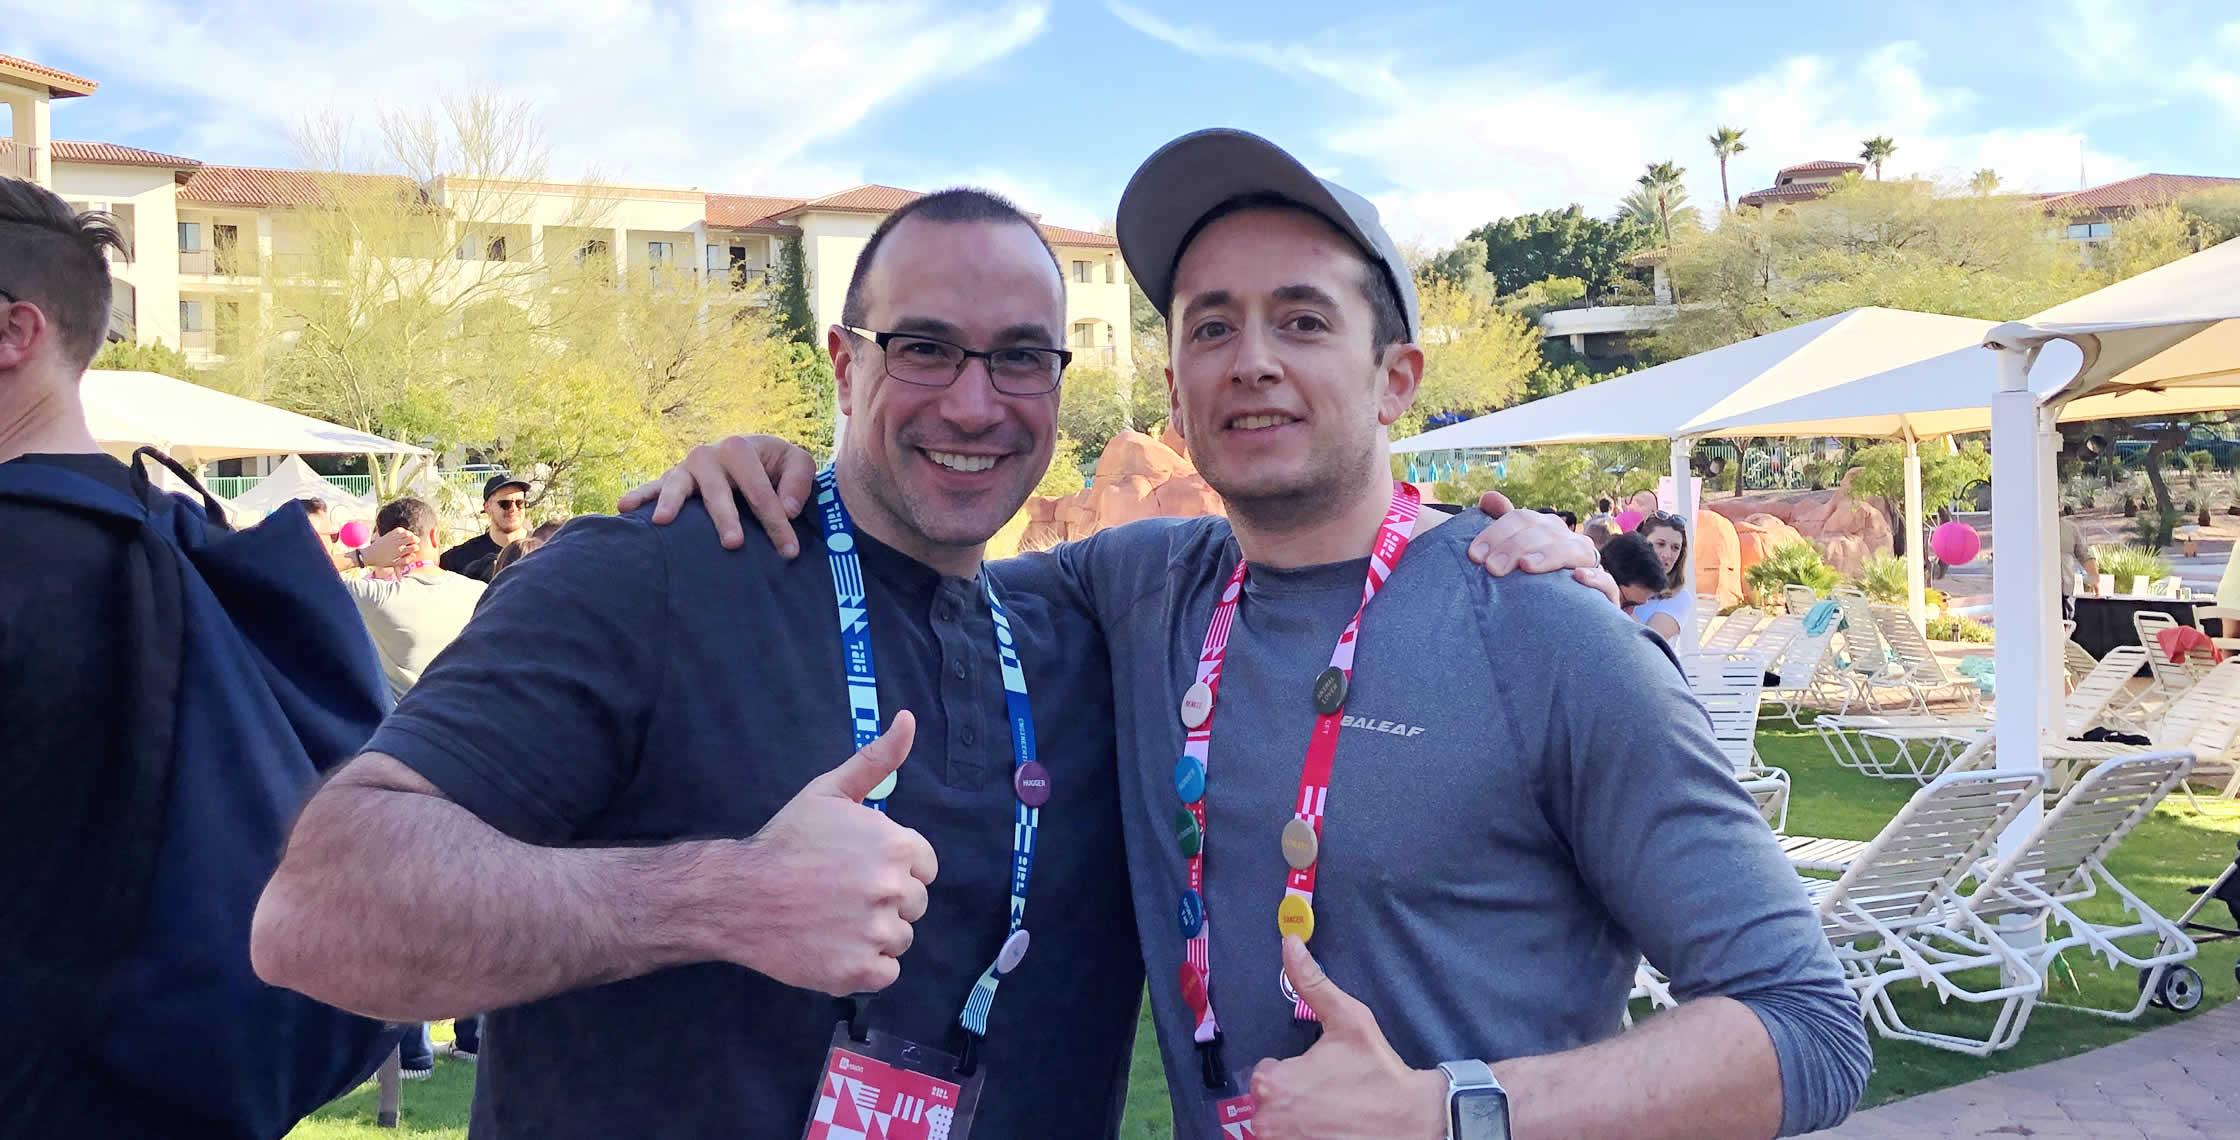 Ben Nadel at InVision In Real Life (IRL) 2019 (Phoenix, AZ) with: Scott Markovits